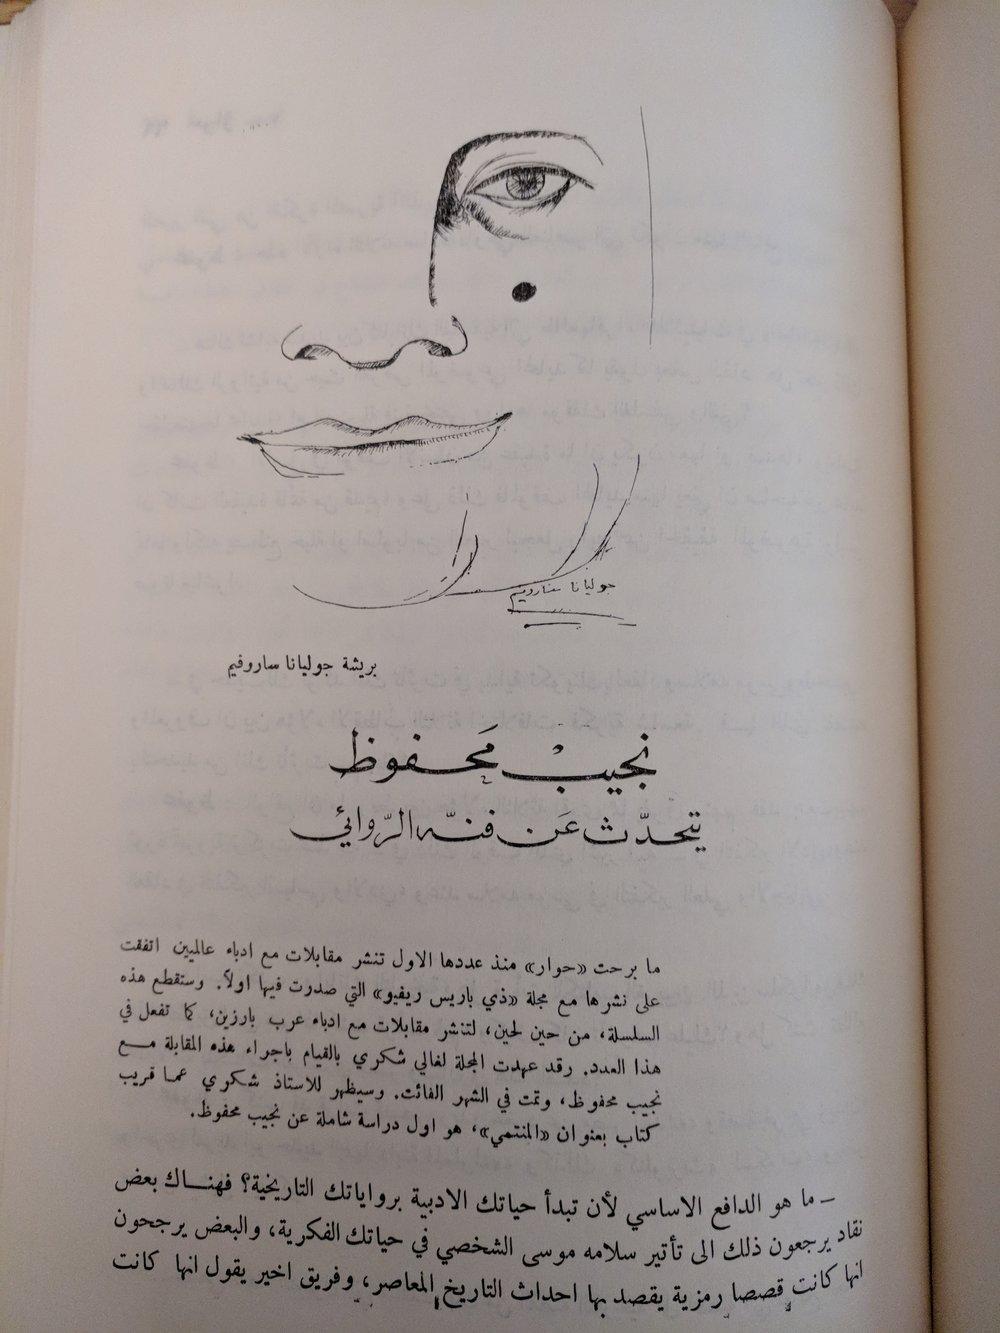 From  Ḥiwār  no. 3  Juliana Seraphim (1934-2005), a Palestinian artist born in Jaffa.